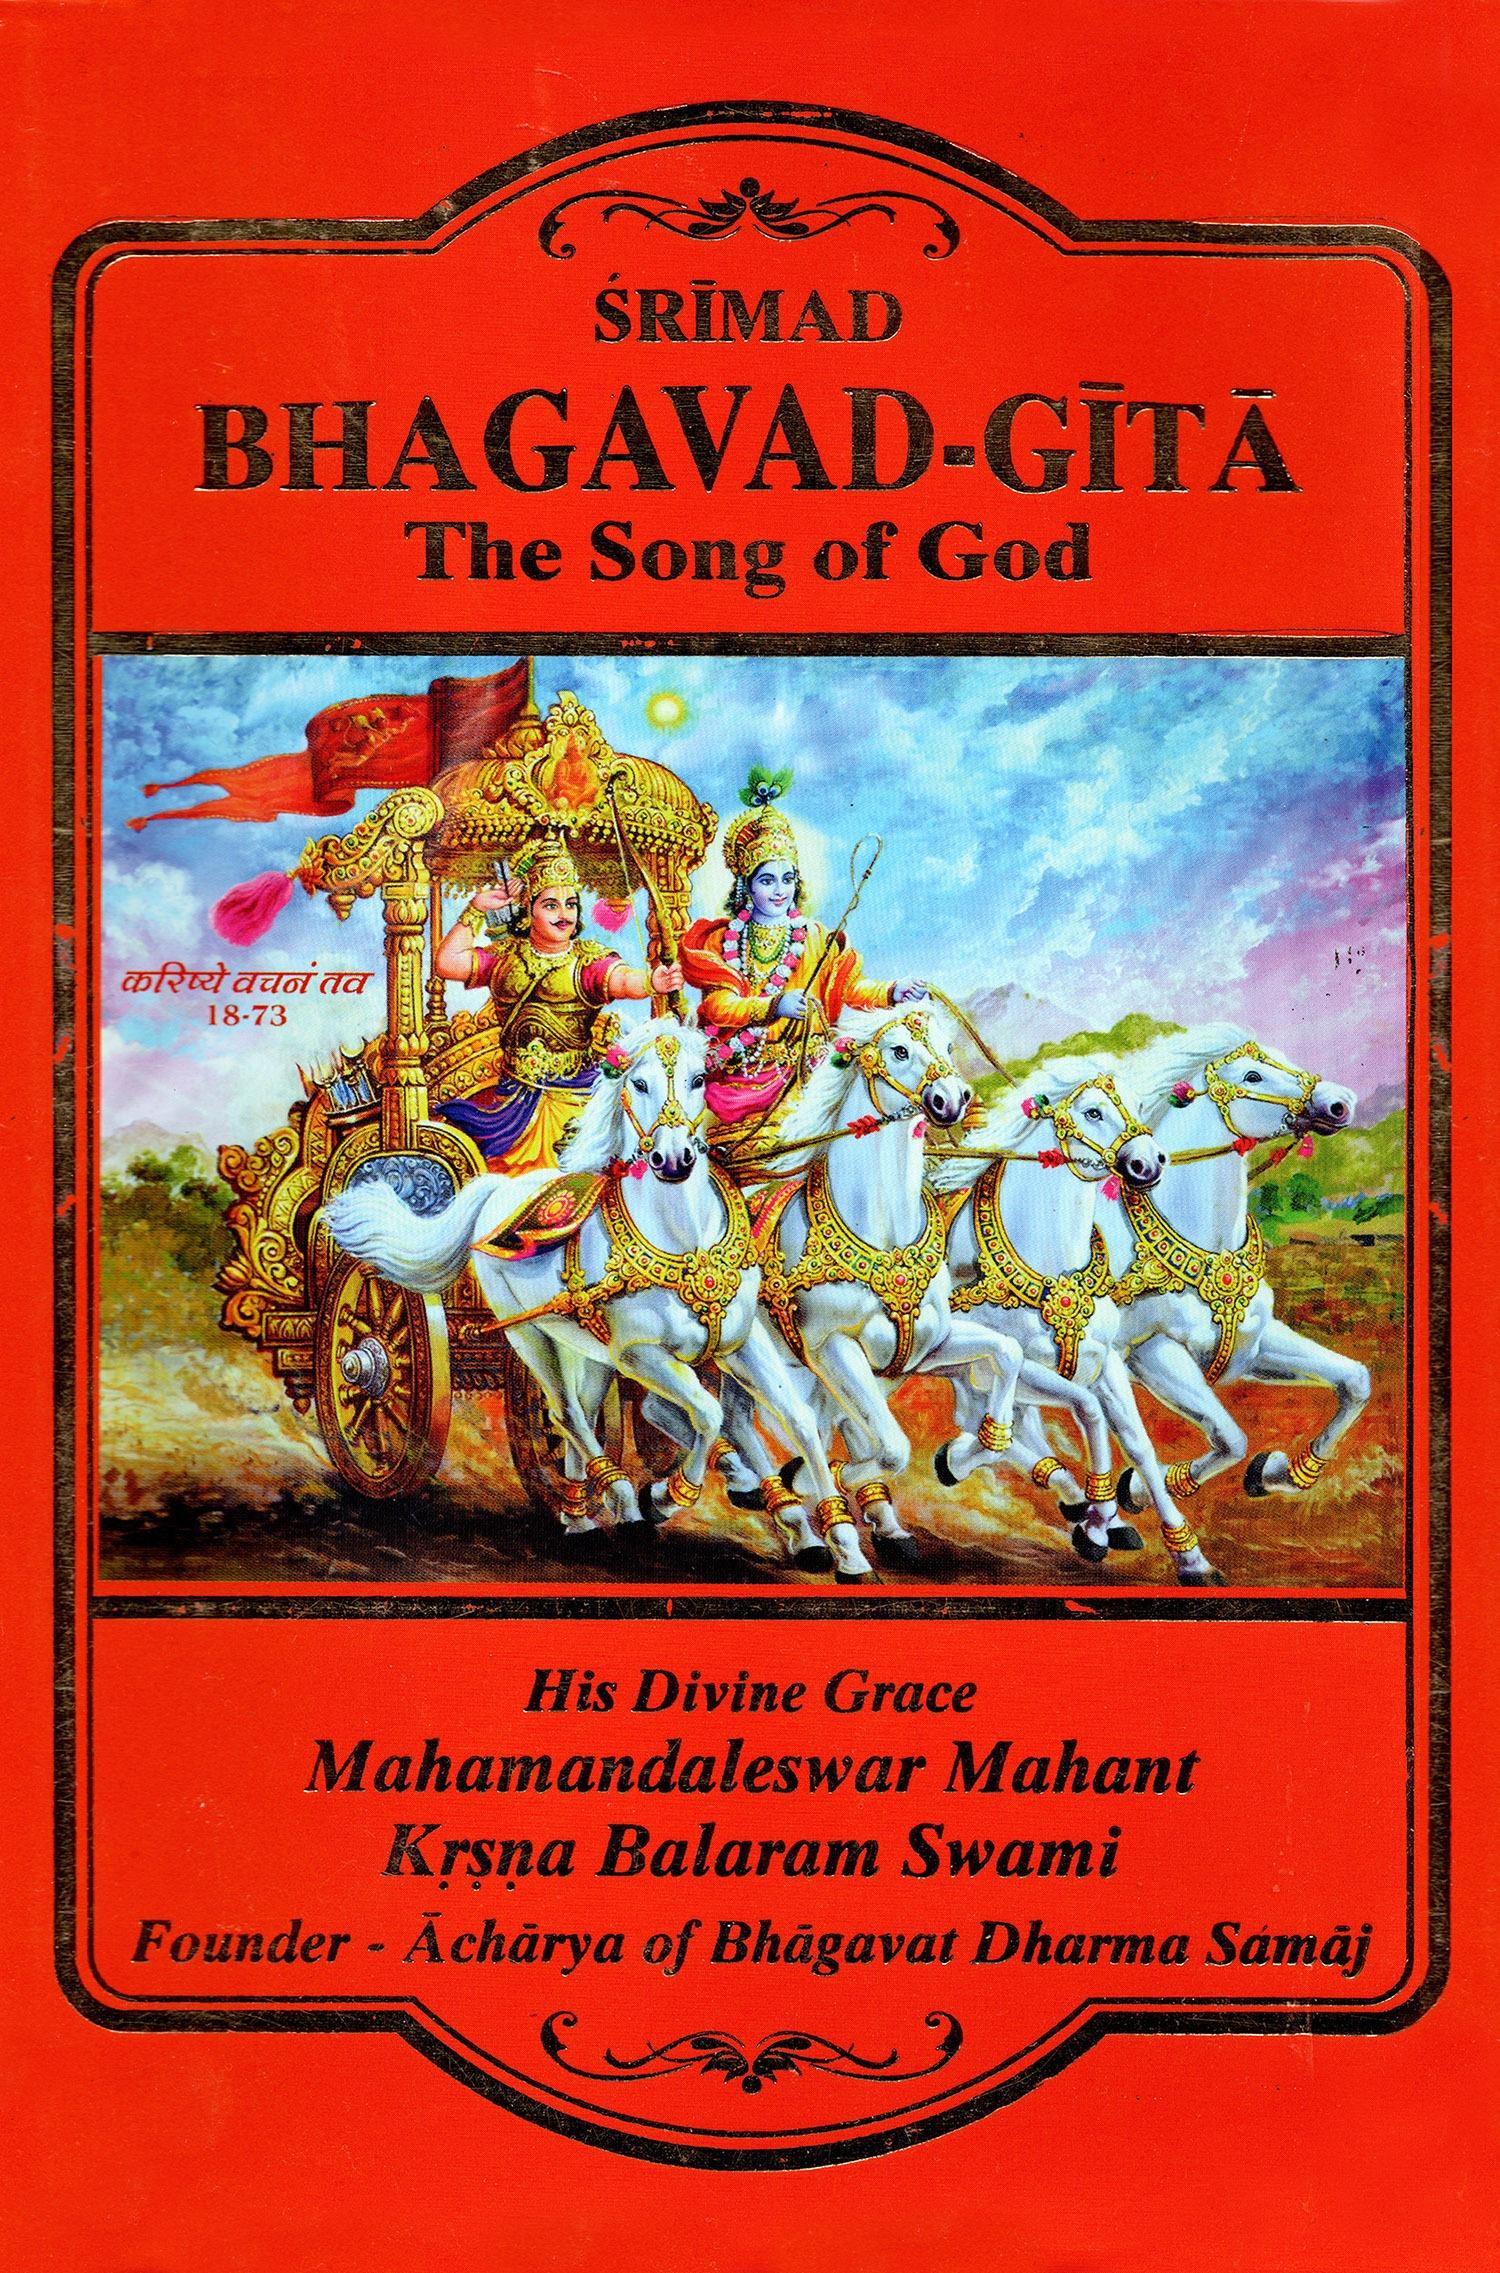 The Song of God: Bhagavad-Gita